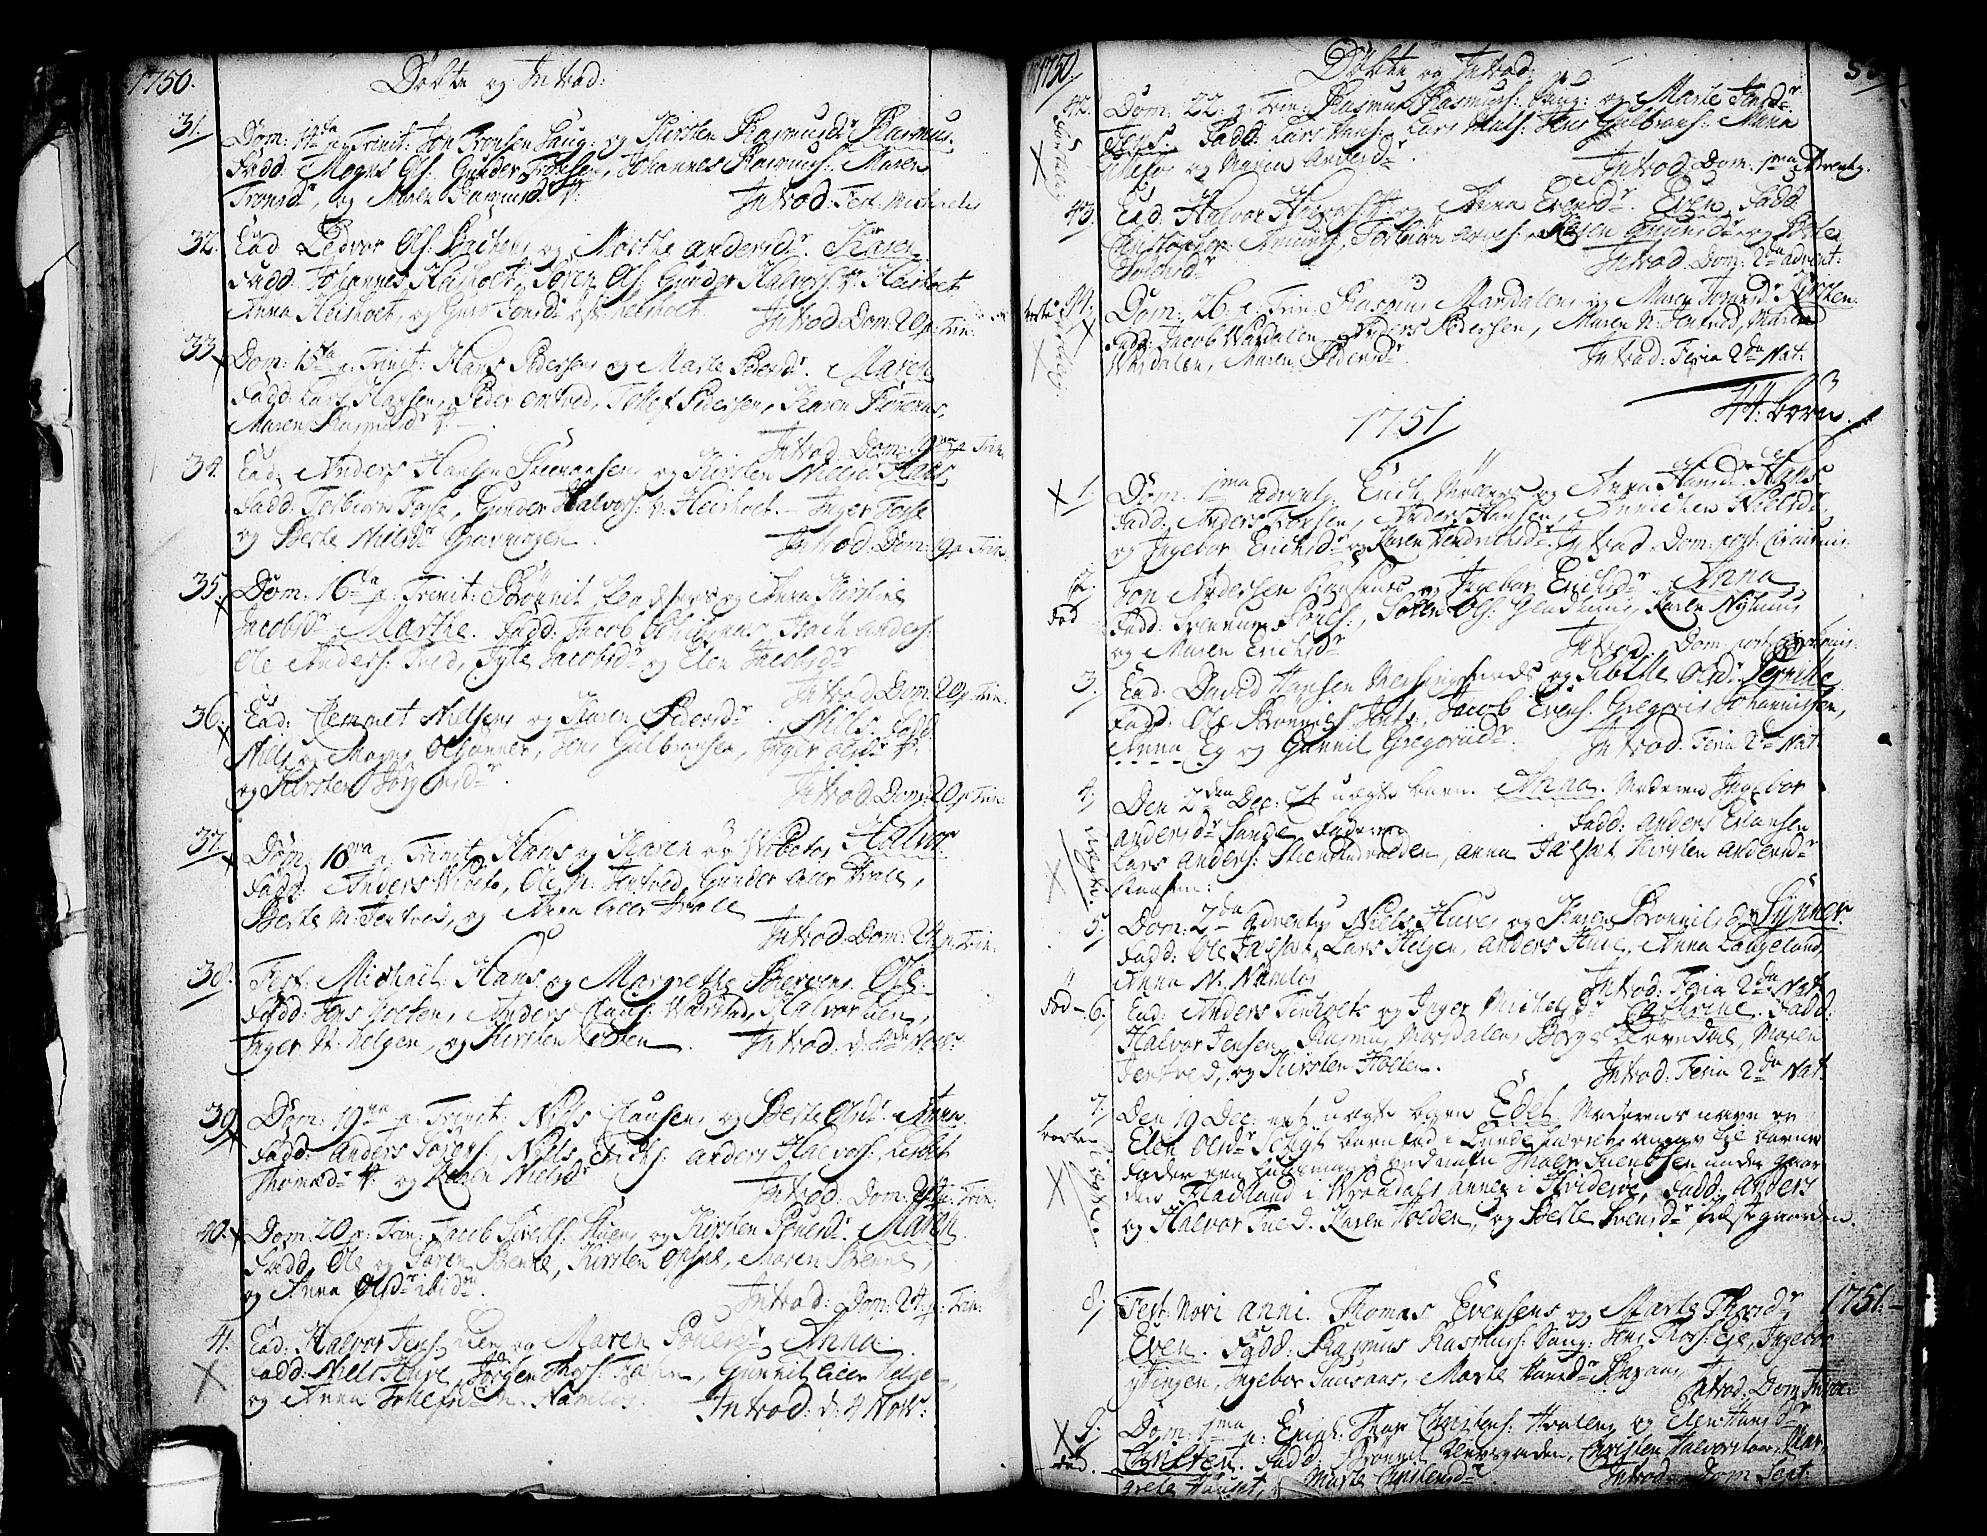 SAKO, Holla kirkebøker, F/Fa/L0001: Ministerialbok nr. 1, 1717-1779, s. 55